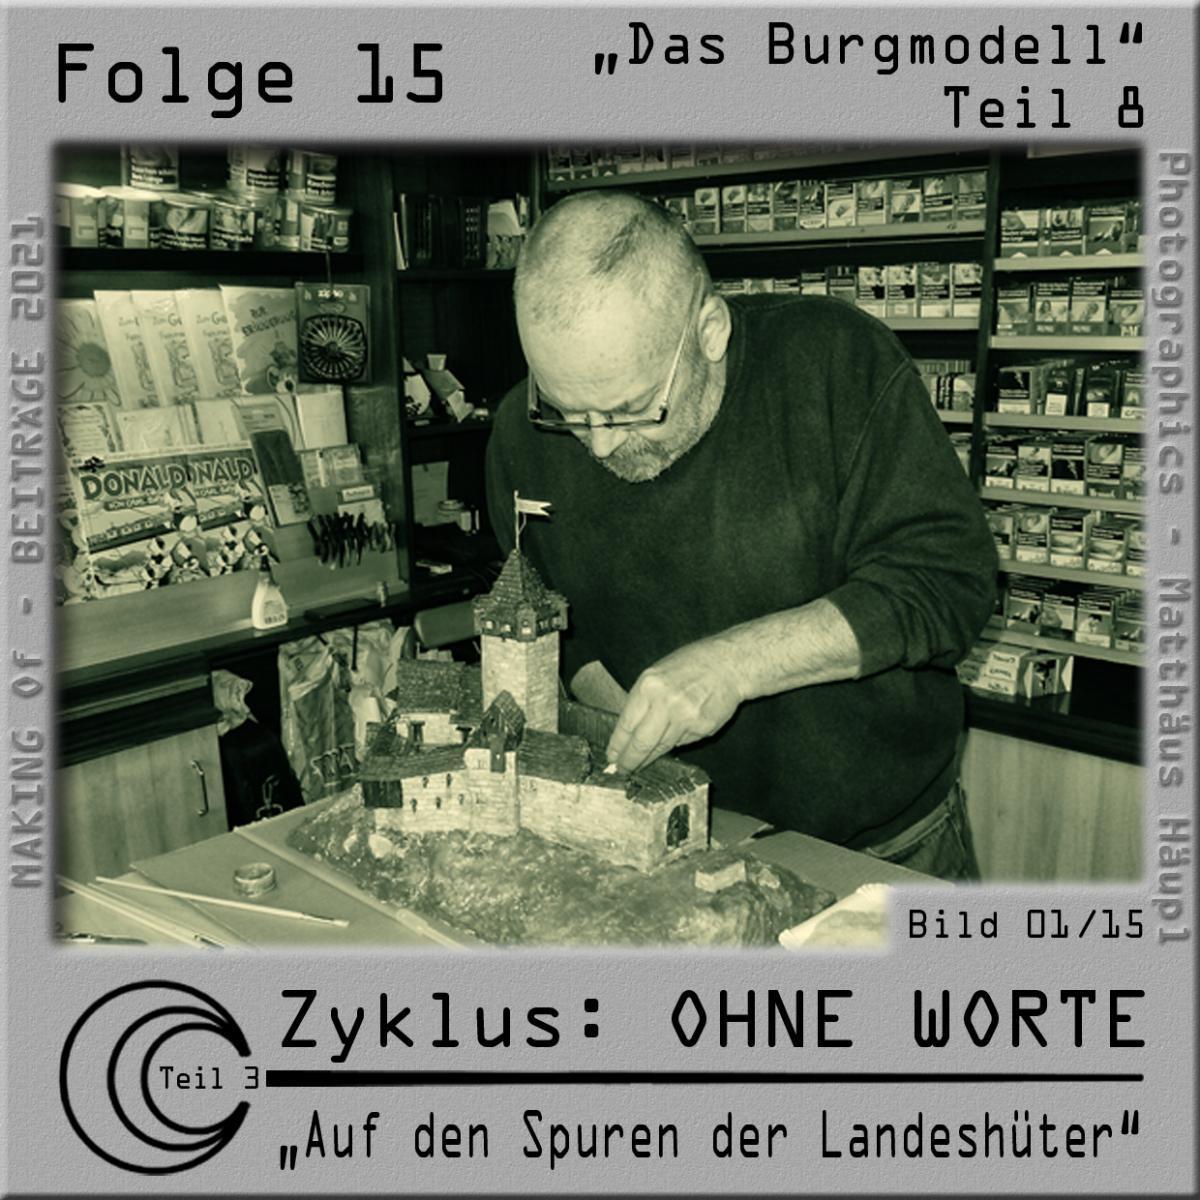 Folge-15 Das-Burgmodell Teil-8-01